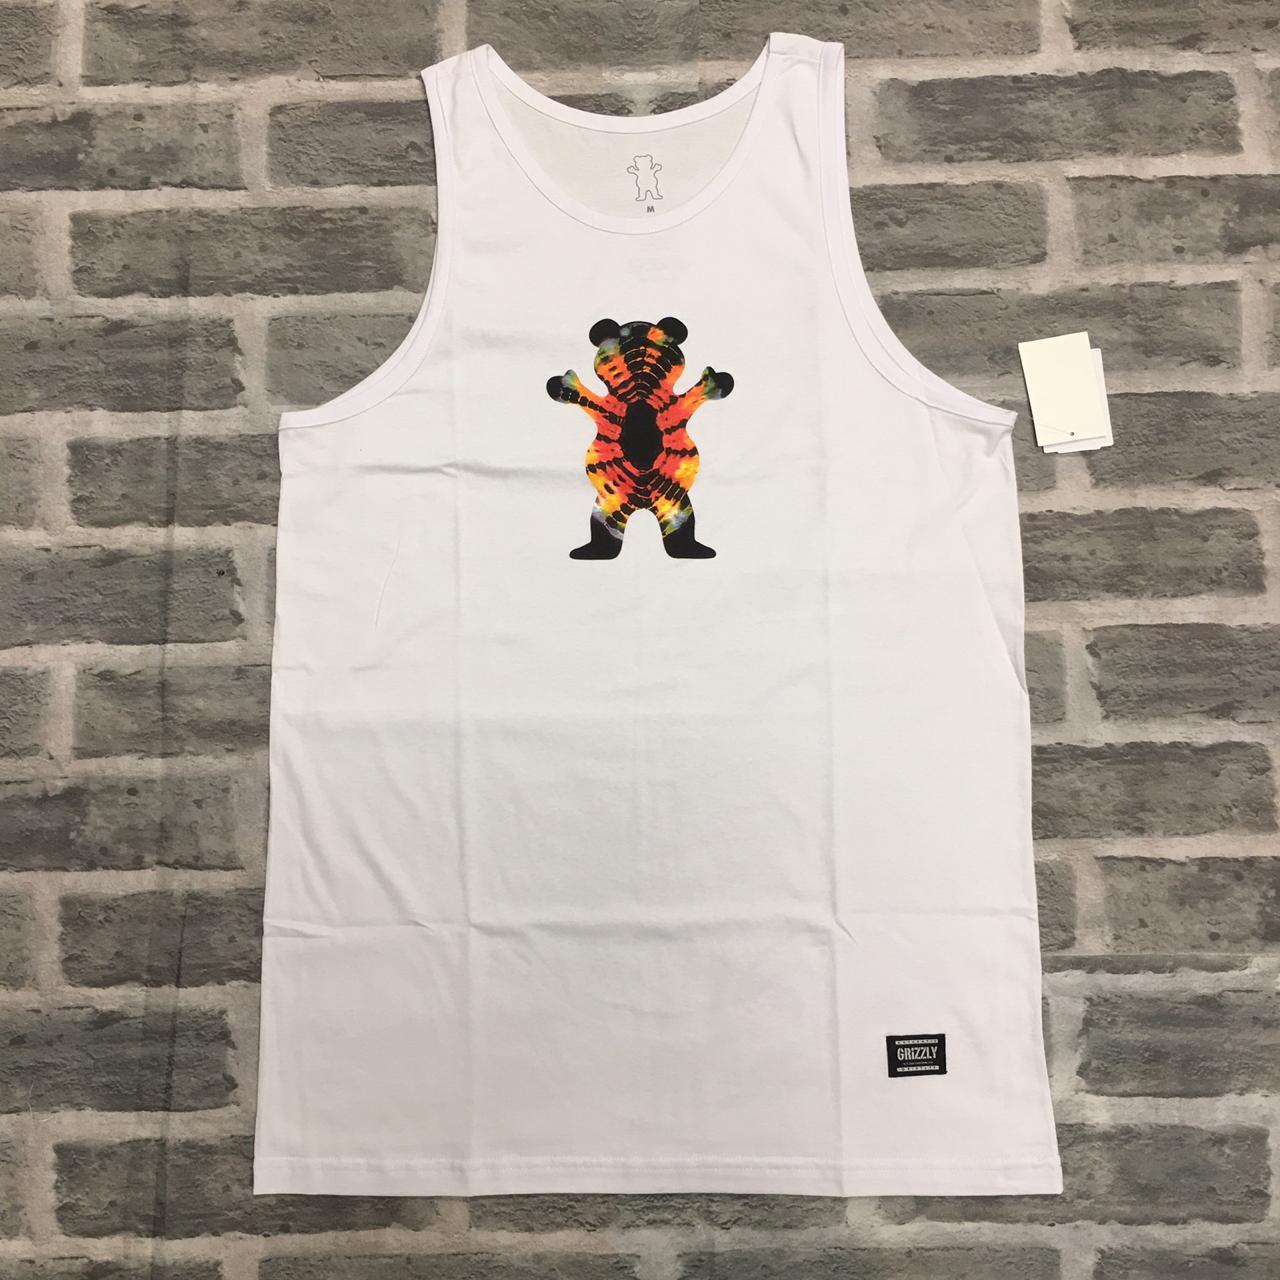 Camiseta regata grizzly og bear tie dye branca